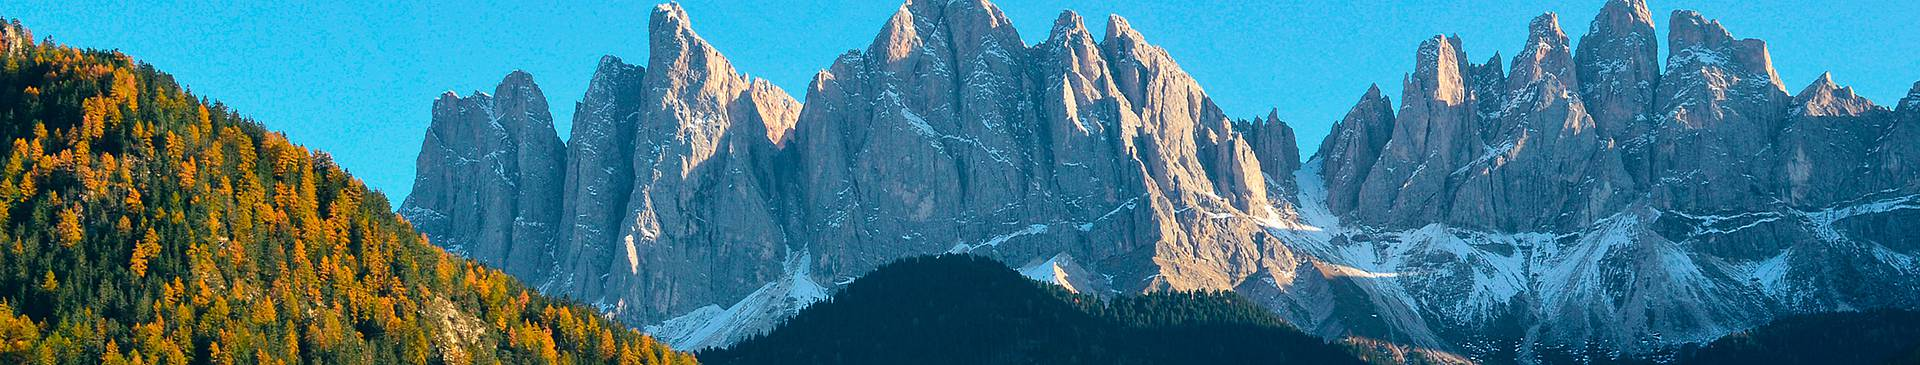 Fall in Italy